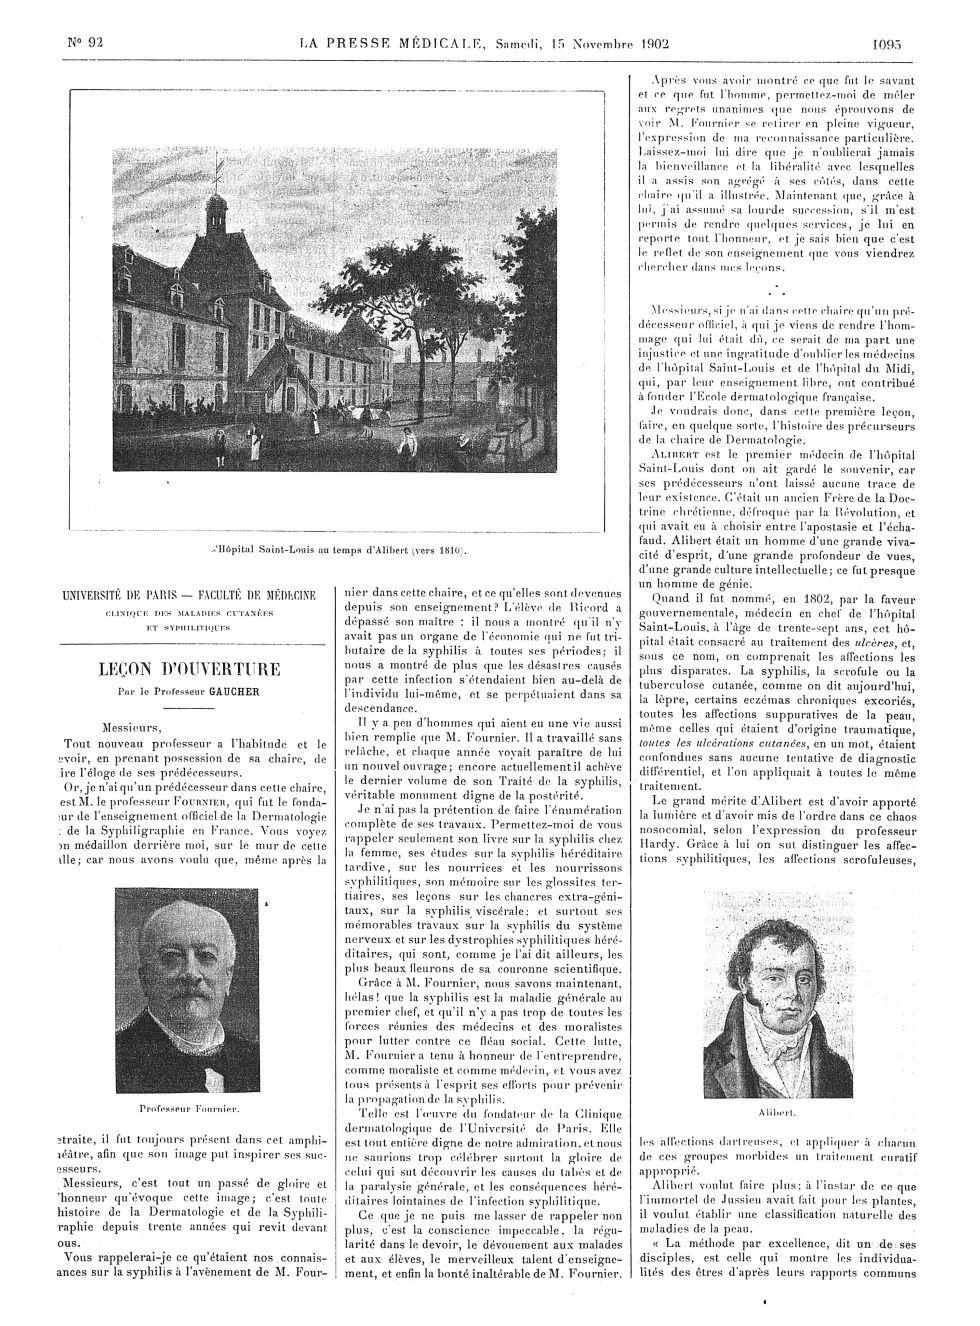 Hôpital Saint-Louis au temps d'Alibert (vers 1810) / Professeur Fournier / Alibert - La Presse médic [...] -  - med100000x1902xartorigx1103